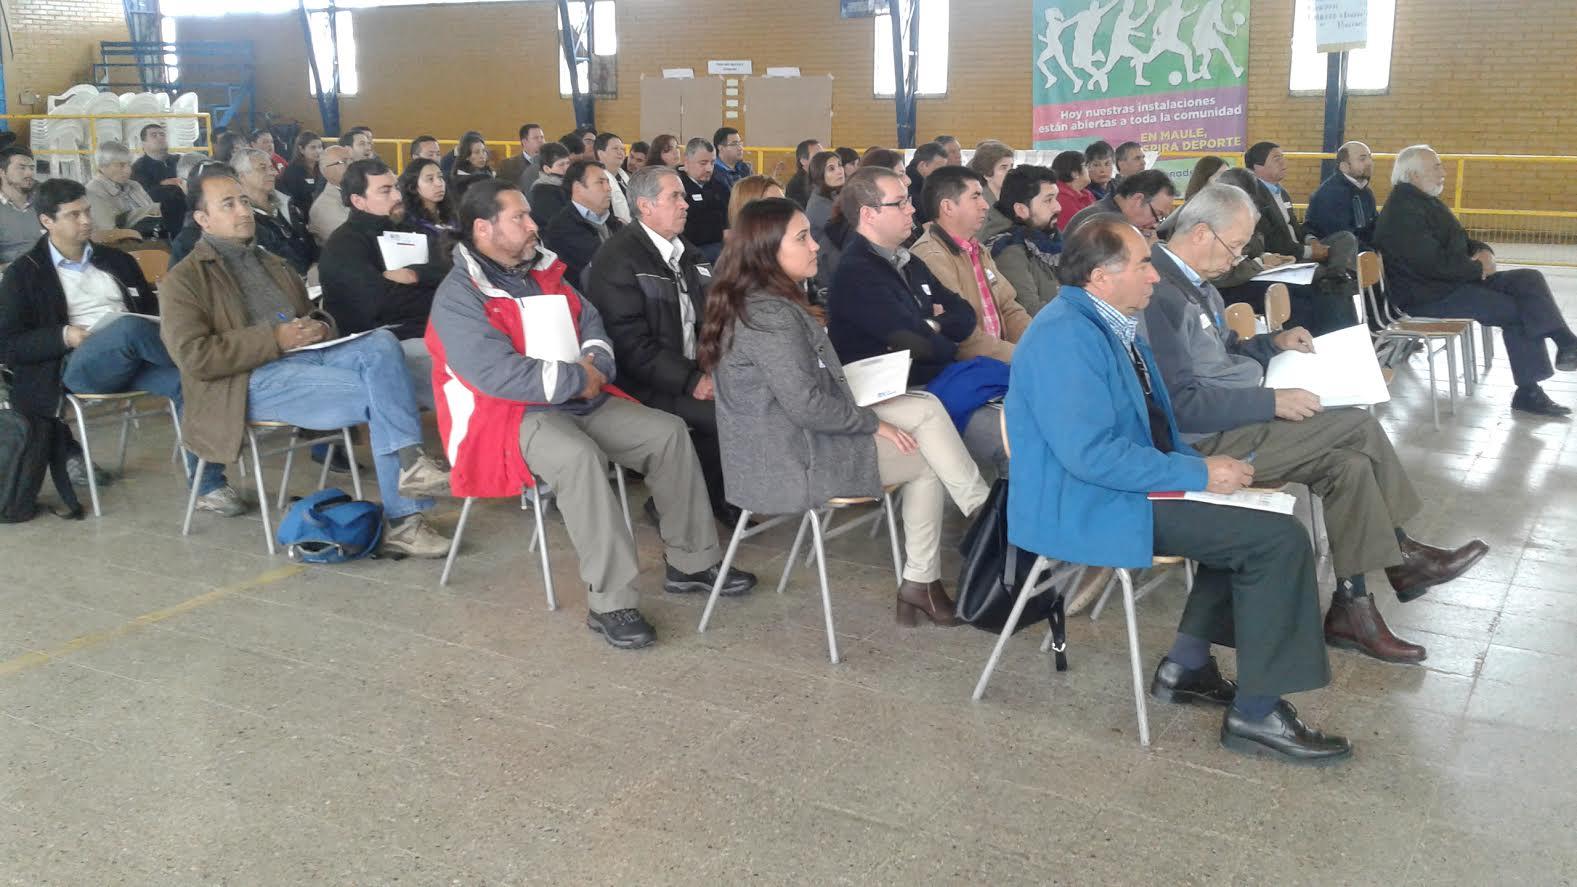 Comuna de Maule demanda mayor infraestructura sanitaria